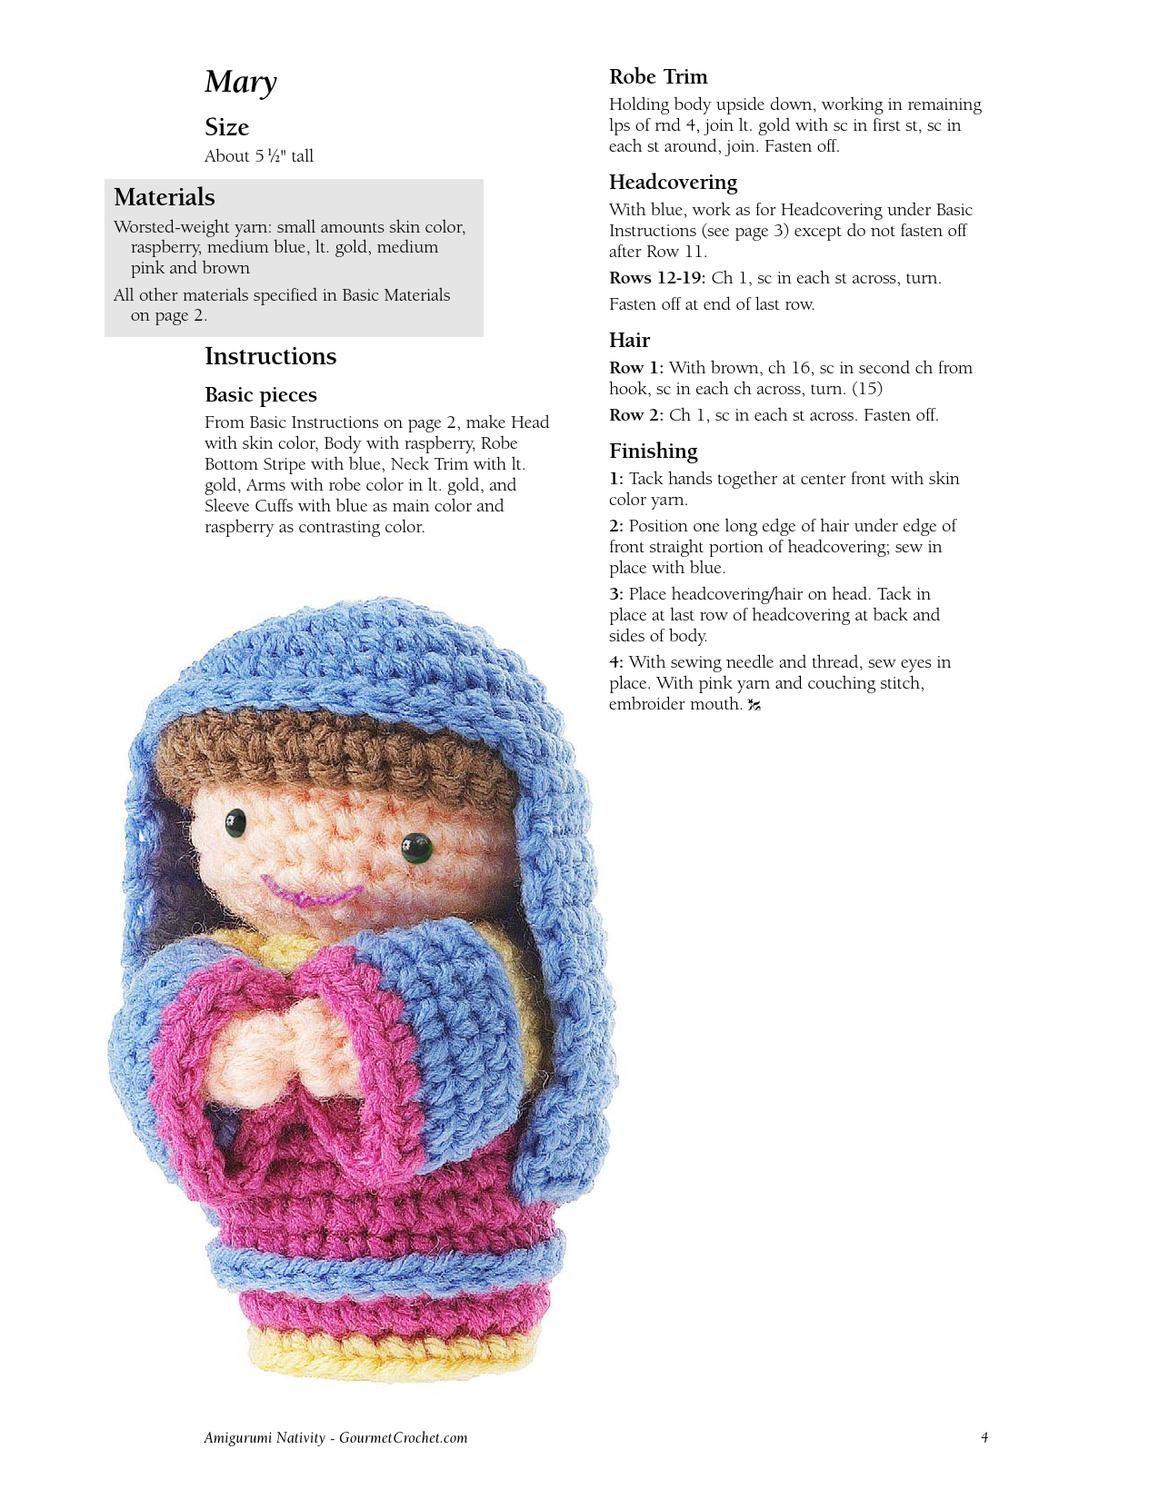 Pin by Christmas Nativity on Christmas Nativity | Crochet, Nativity ...